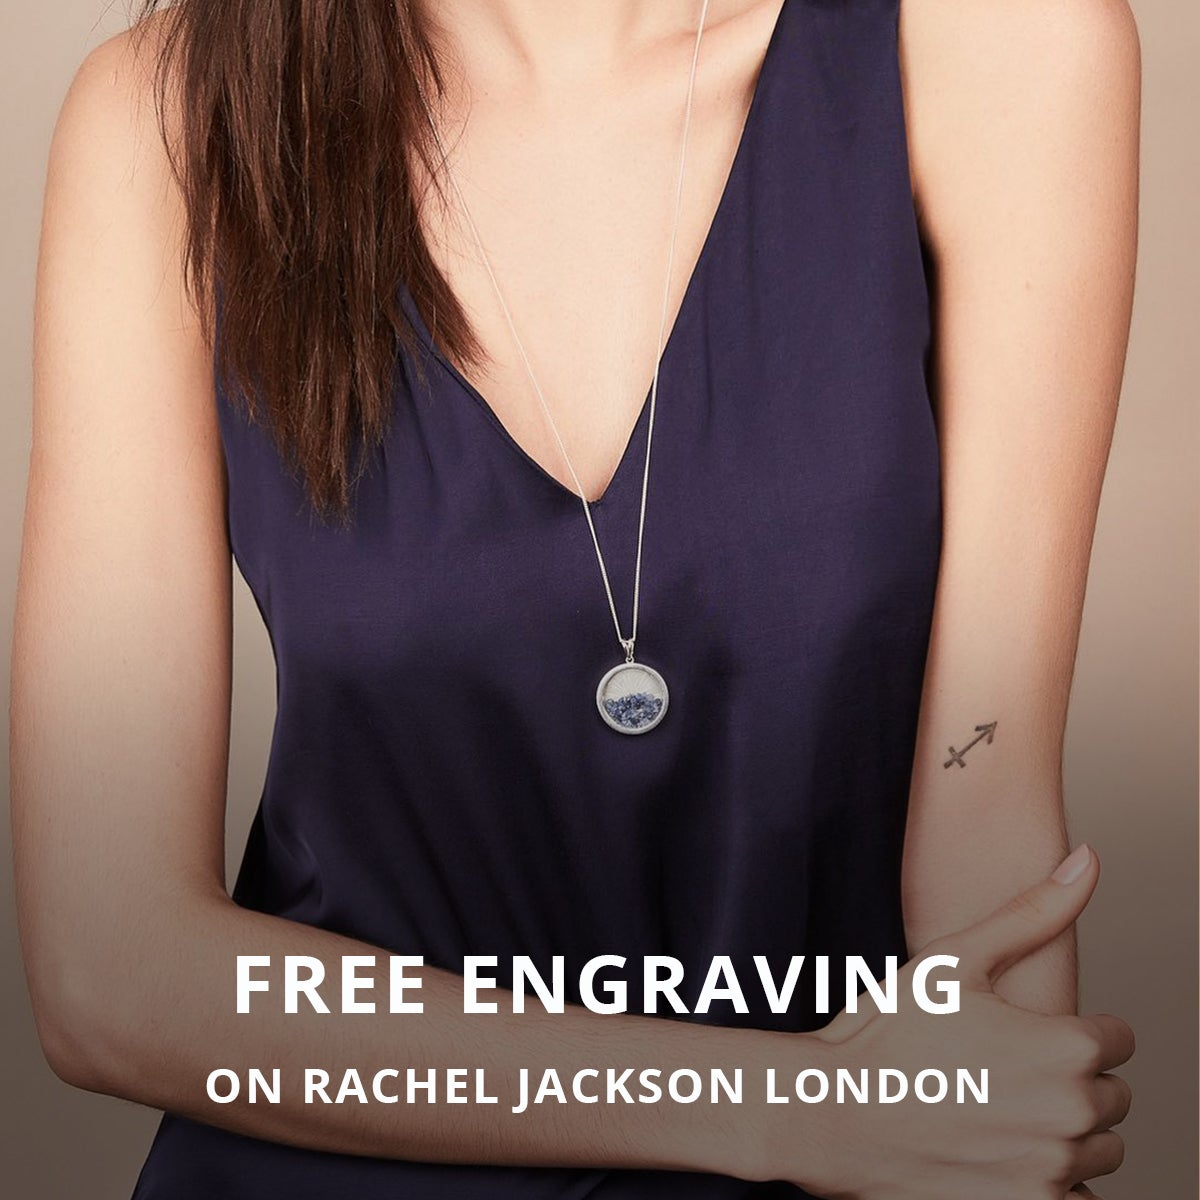 Rachel Jackson Free Engraving